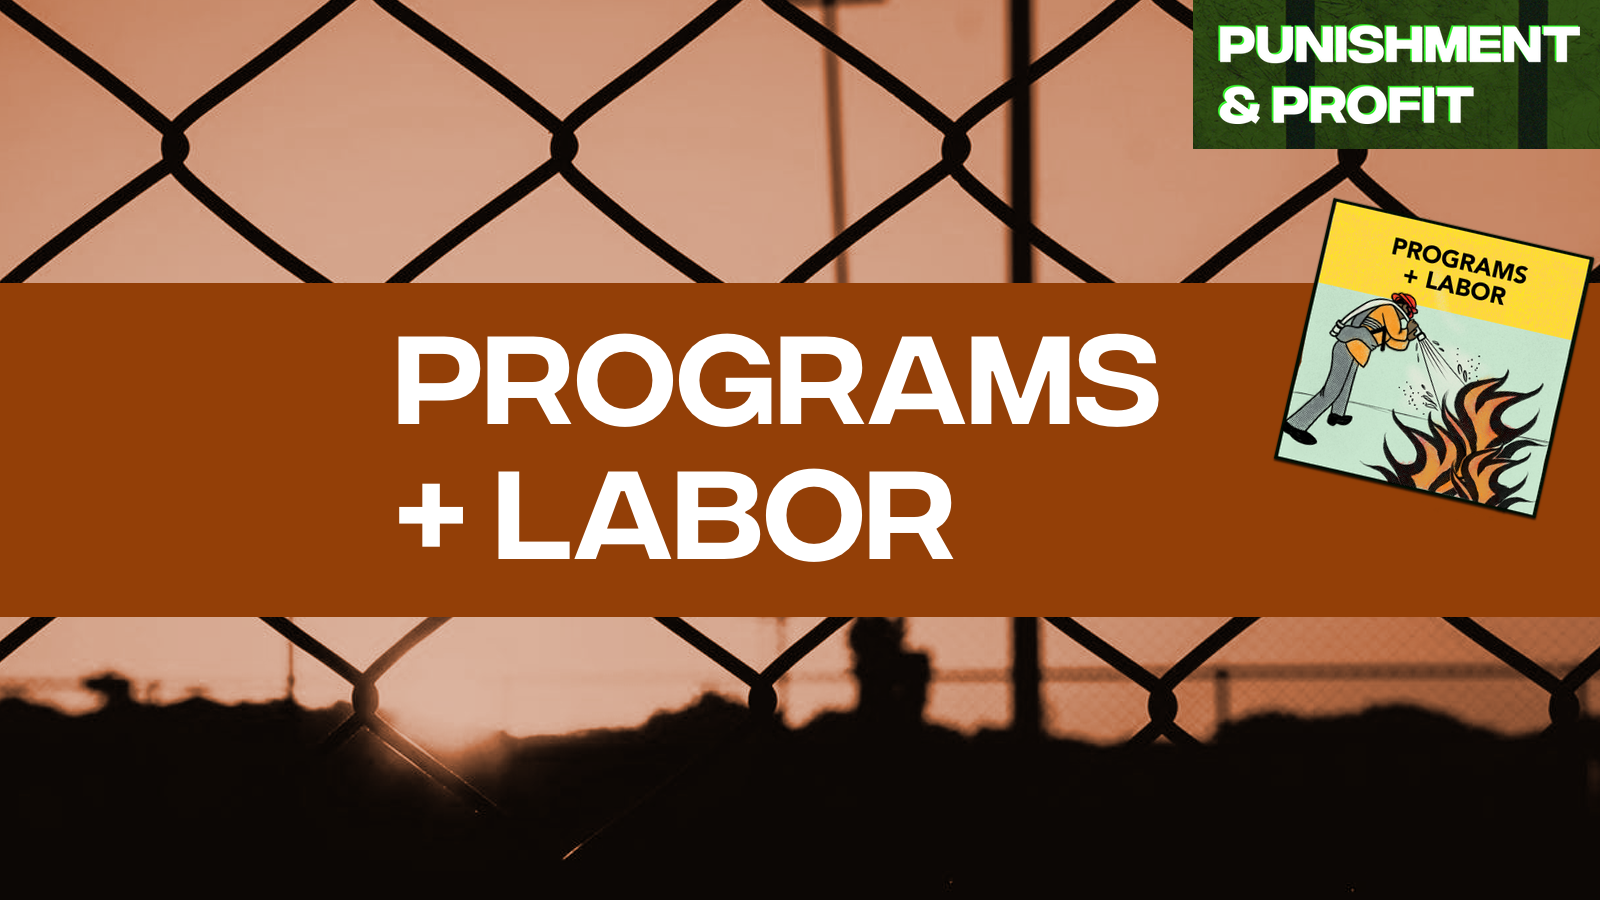 Punishment & Profit: Programs & Labor